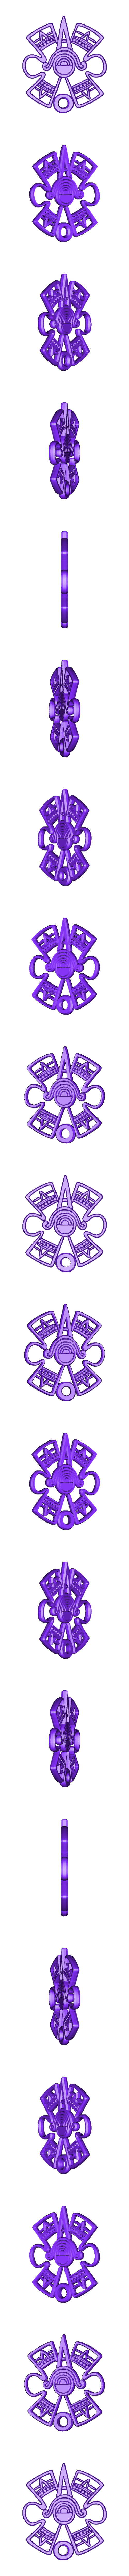 Ancestry3d_FourErasPendant.stl Download free STL file Four Eras Pendant • 3D print design, Cilshell